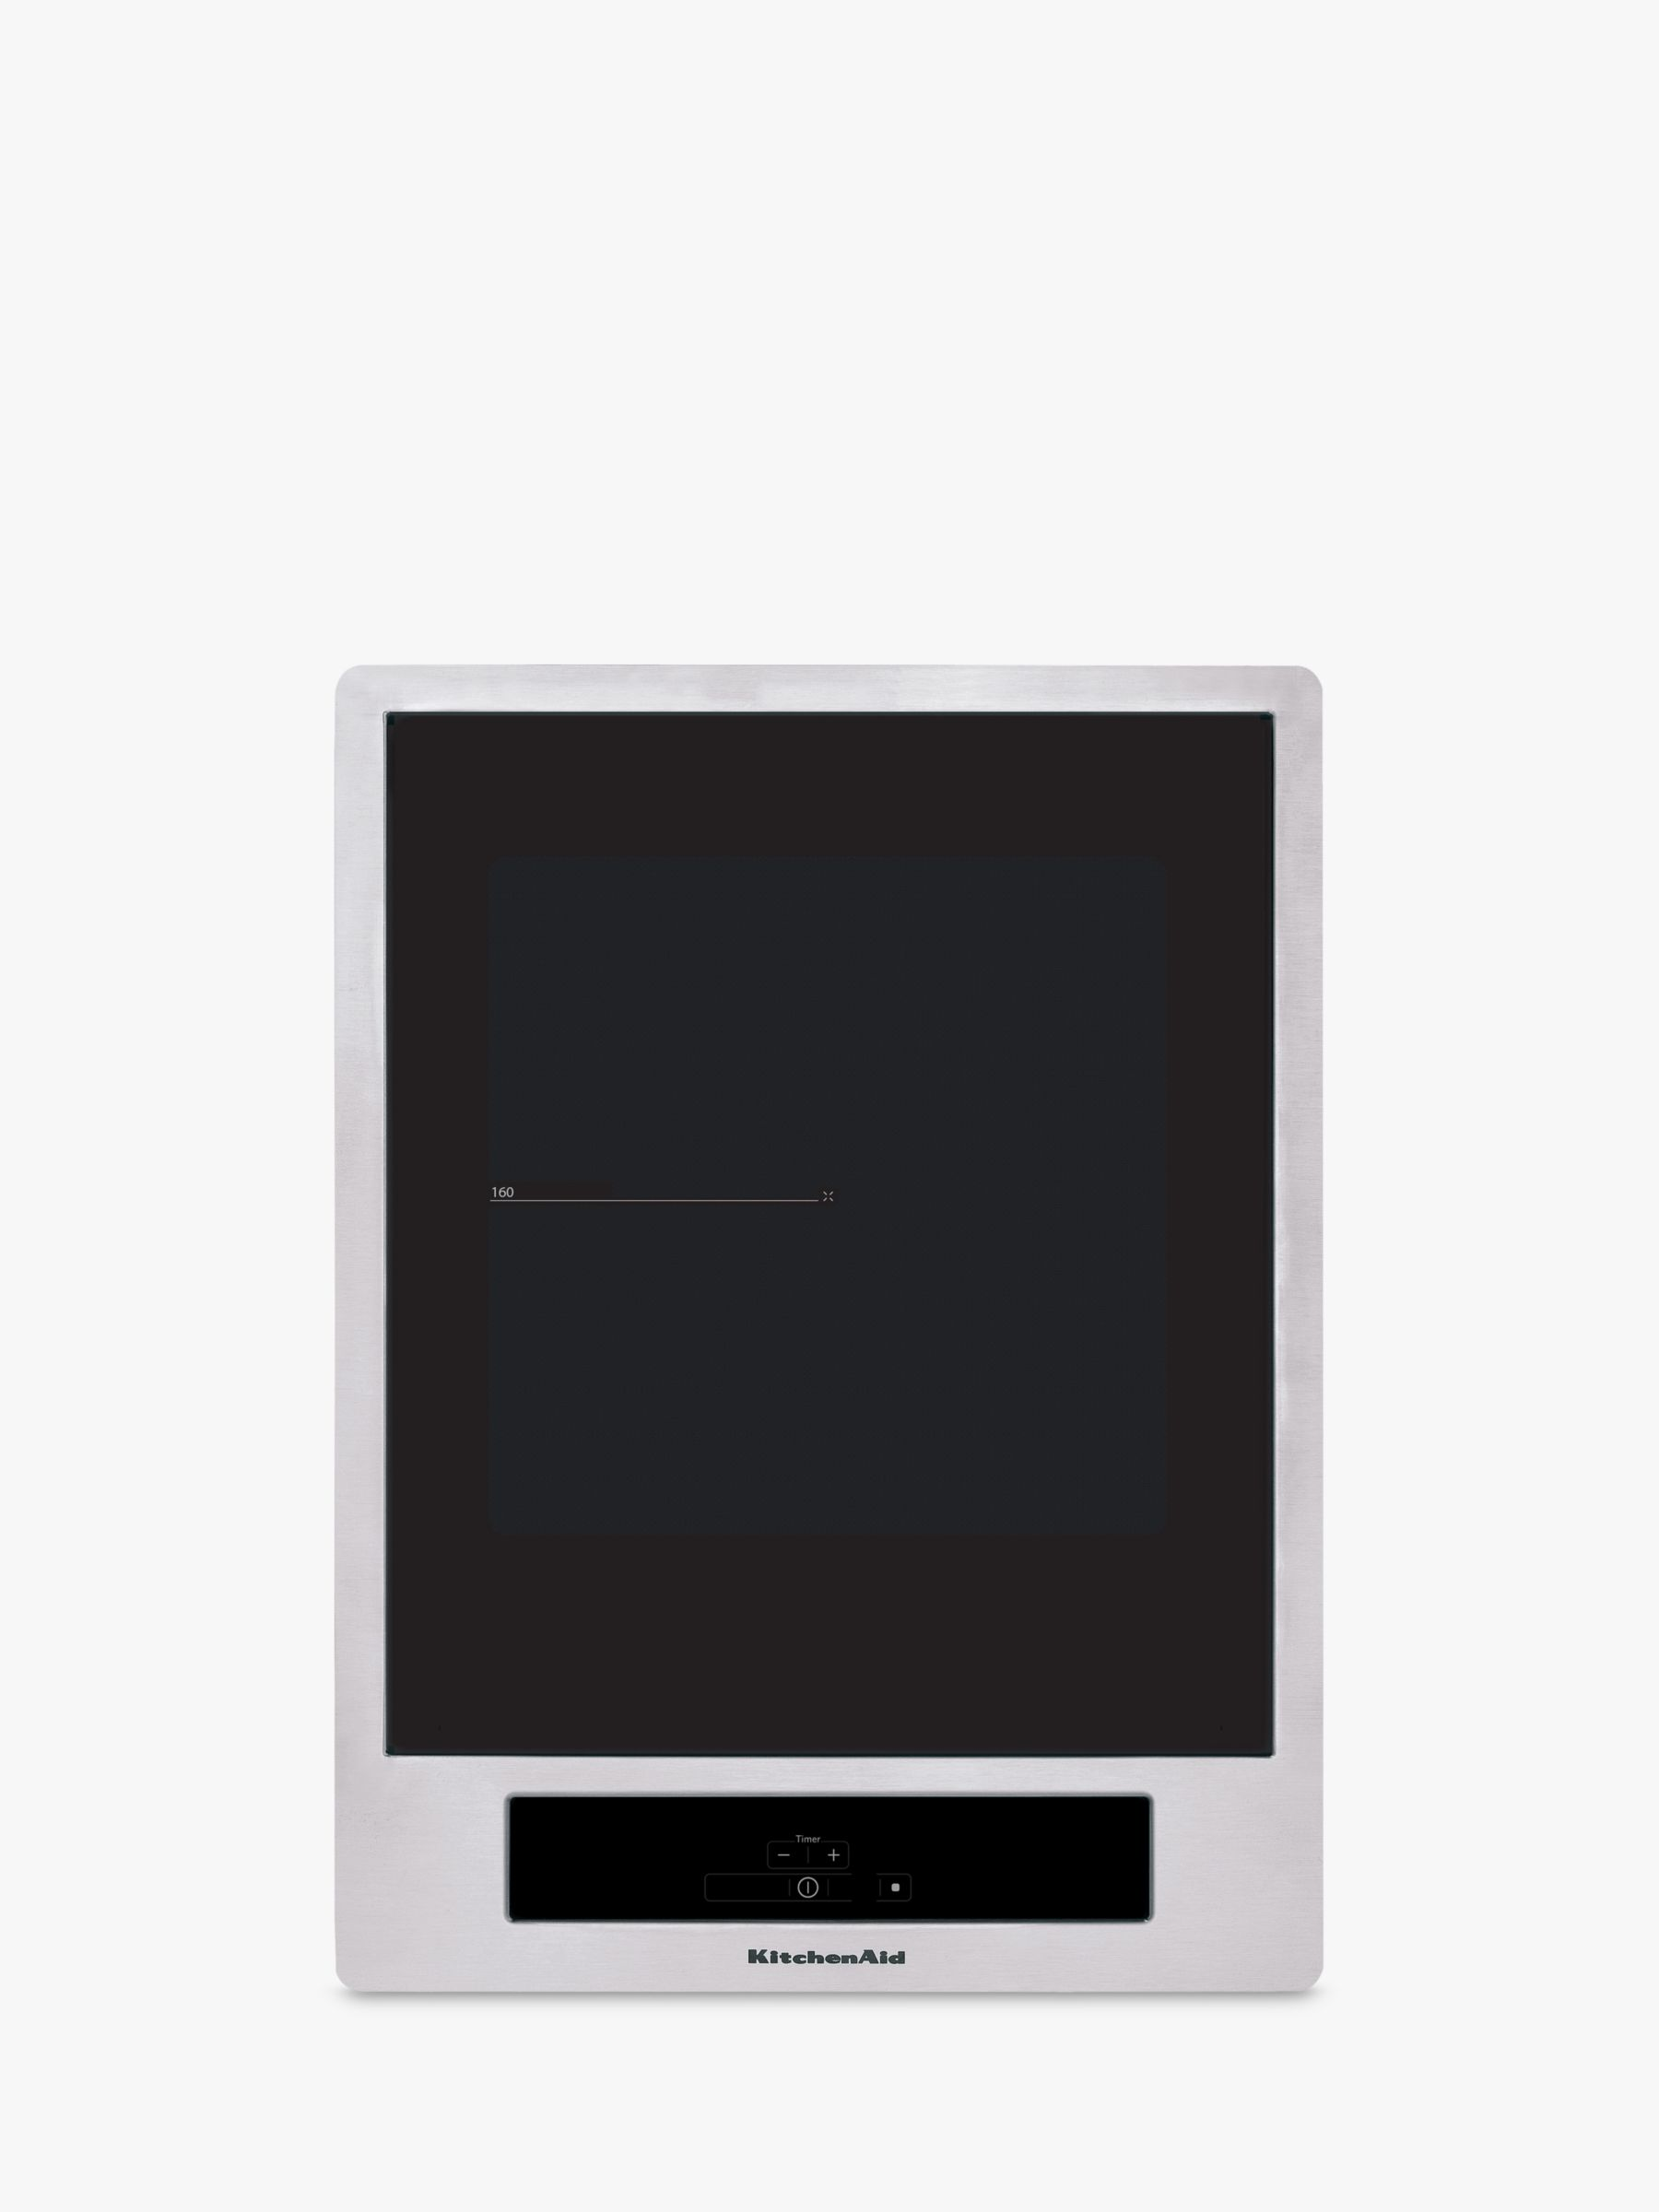 KitchenAid KitchenAid KHYD2 Integrated Induction Hob, Black